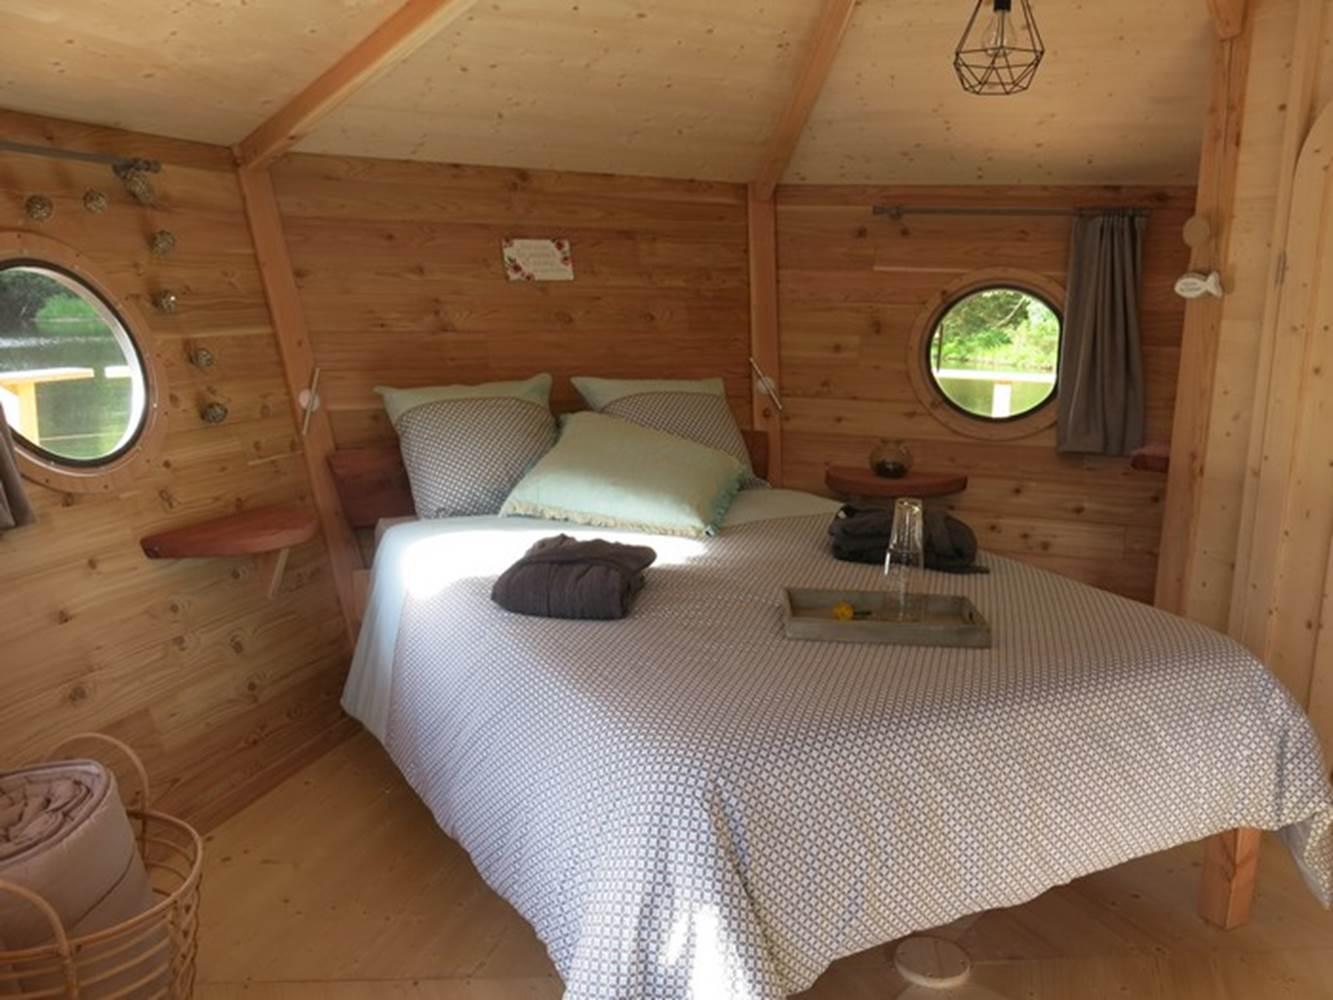 CABANES FLOTTANTES - Chambre de la cabane Le Nid - Morbihan - Bretagne Sud © LAIDIN